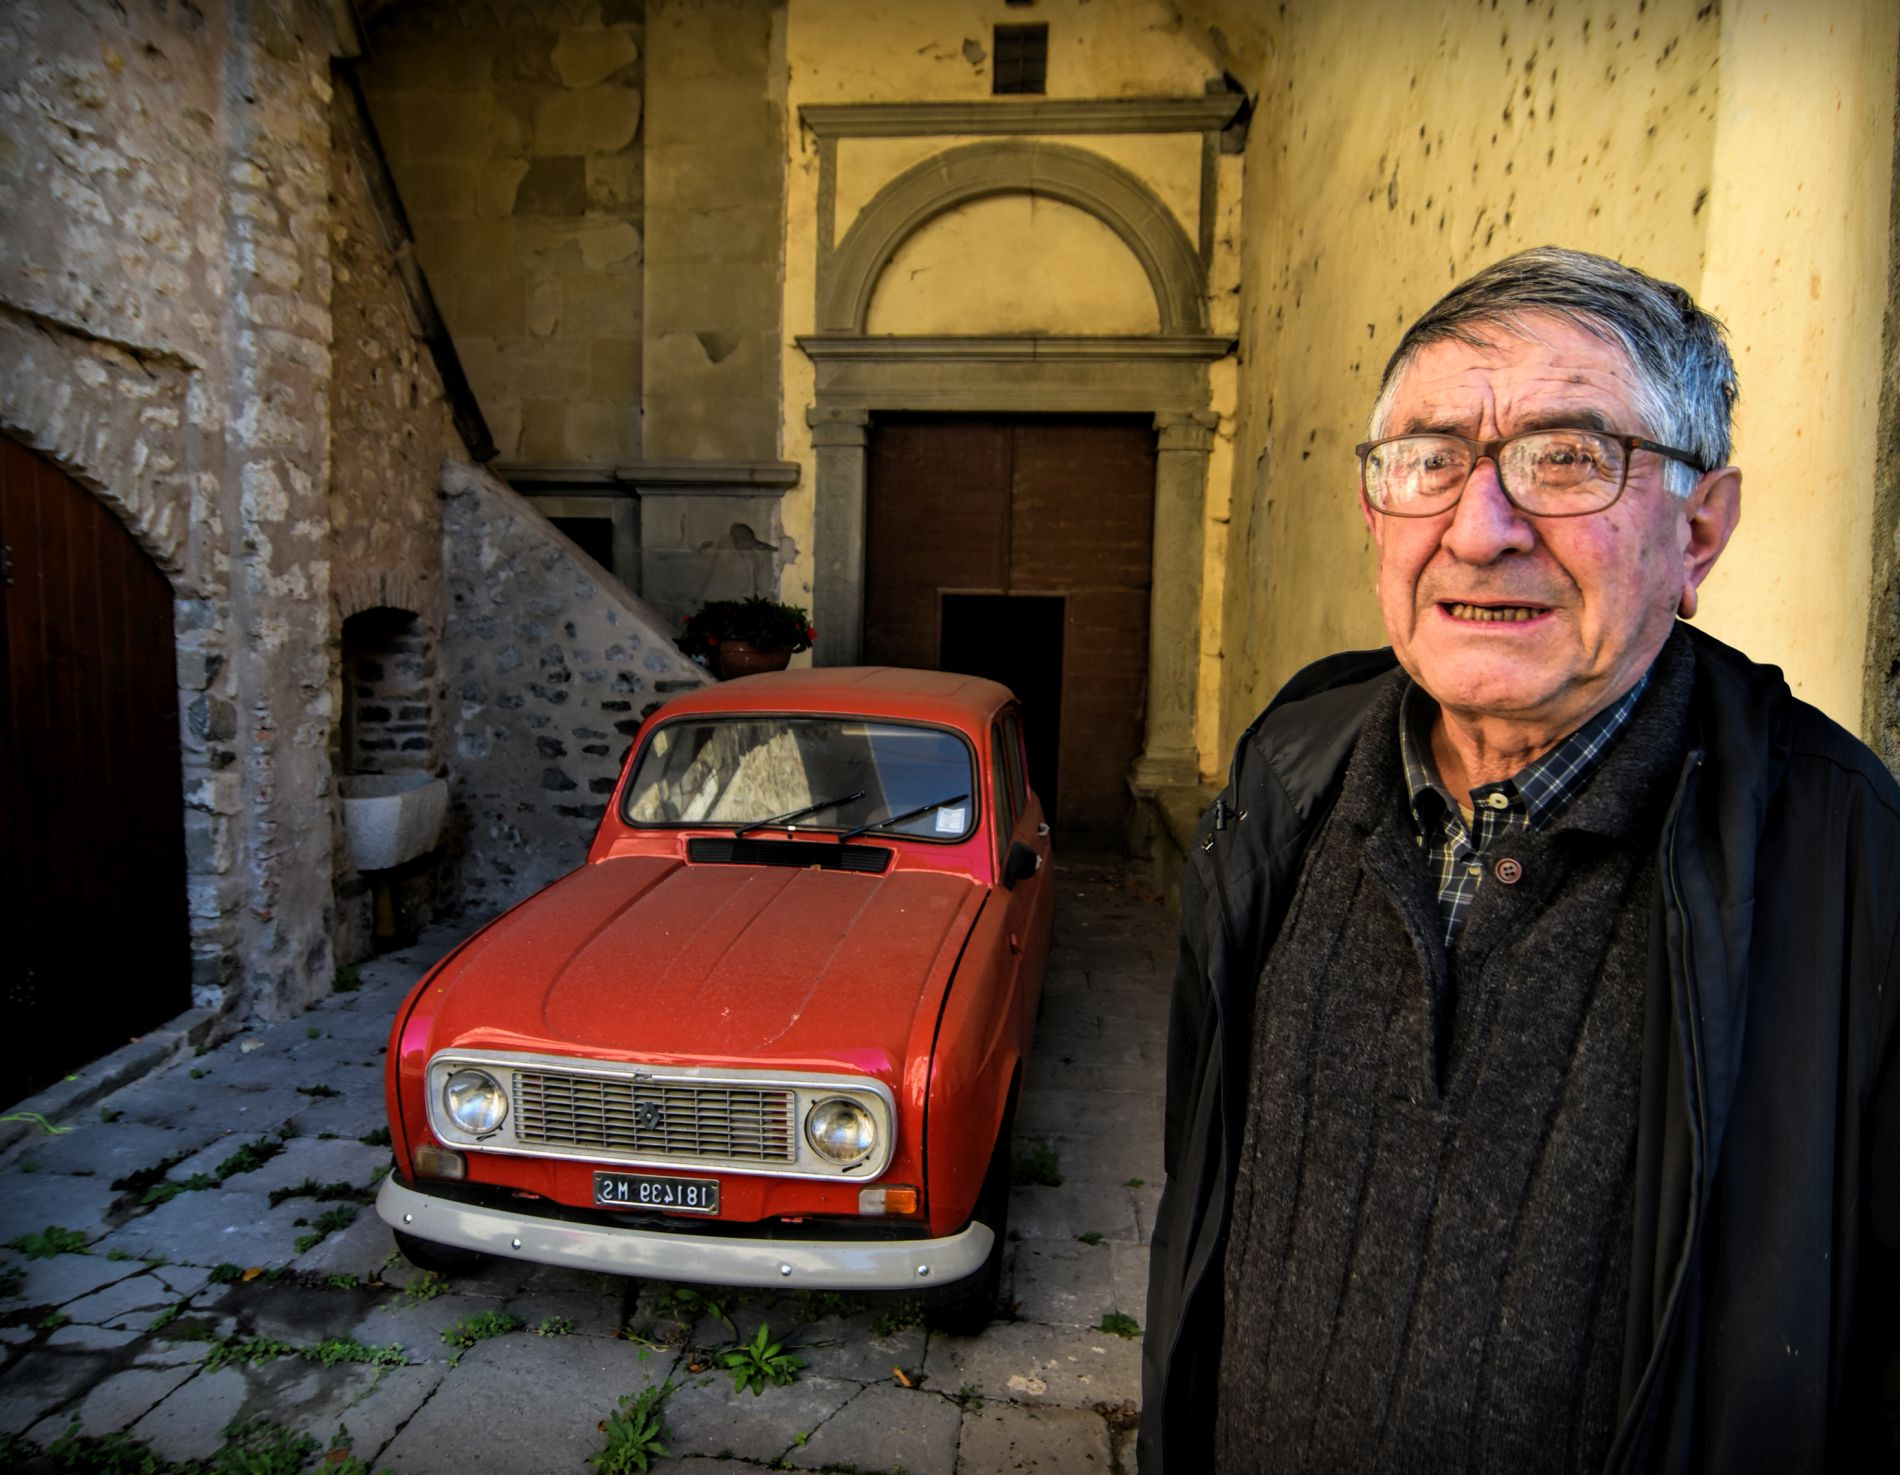 Don Lorenzo Piagneri